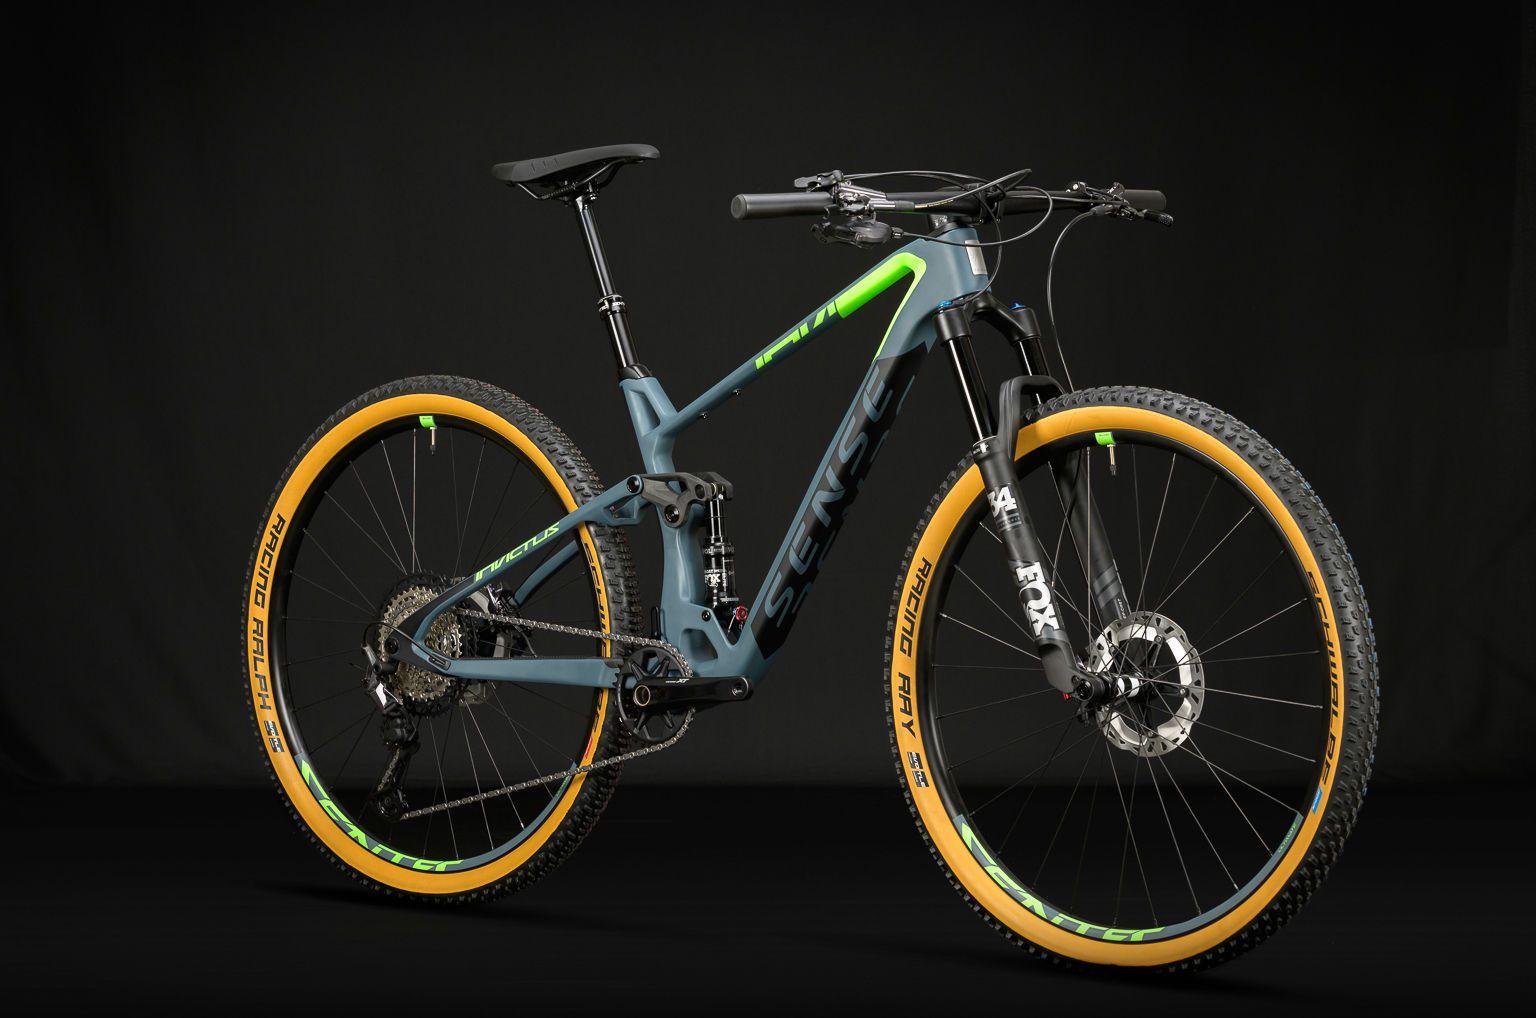 Bicicleta SENSE Invictus Evo 2020 - Verde Neon/Chumbo